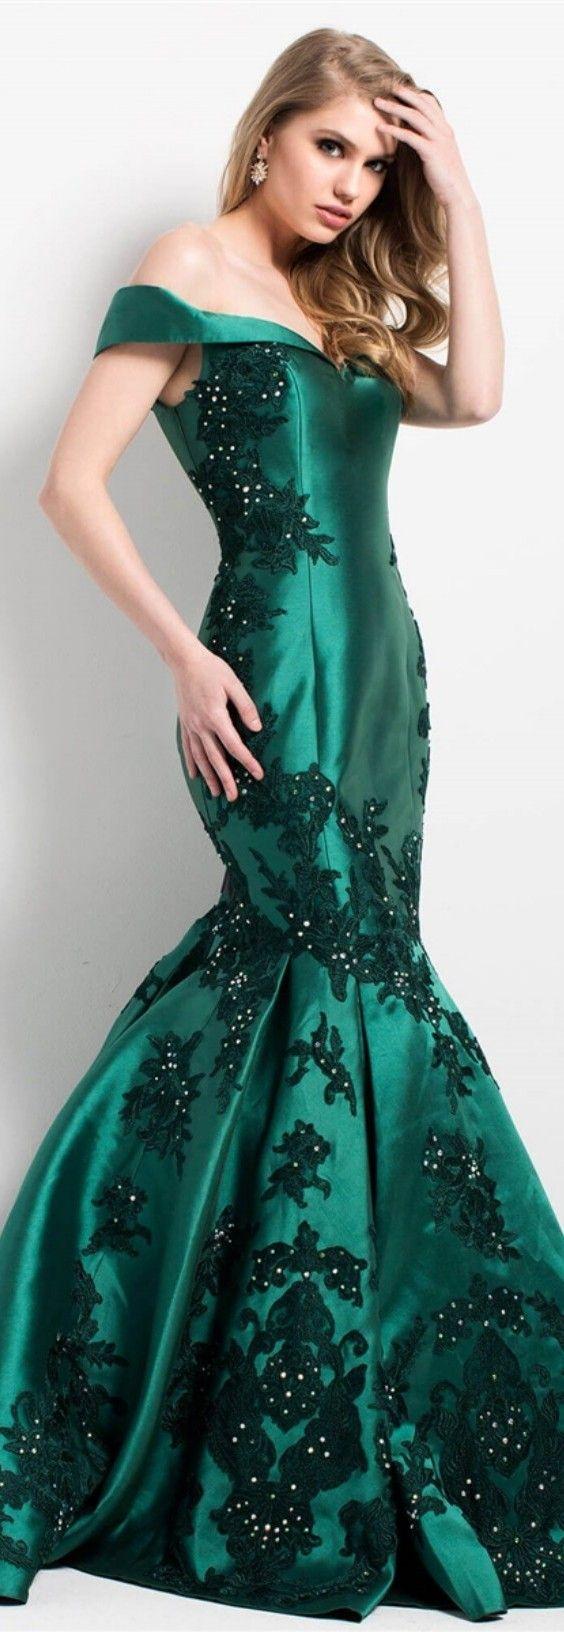 JOVANI ⚘In Emerald Mermaid-Style Funnel Skirt w. Hourglass Figure ...